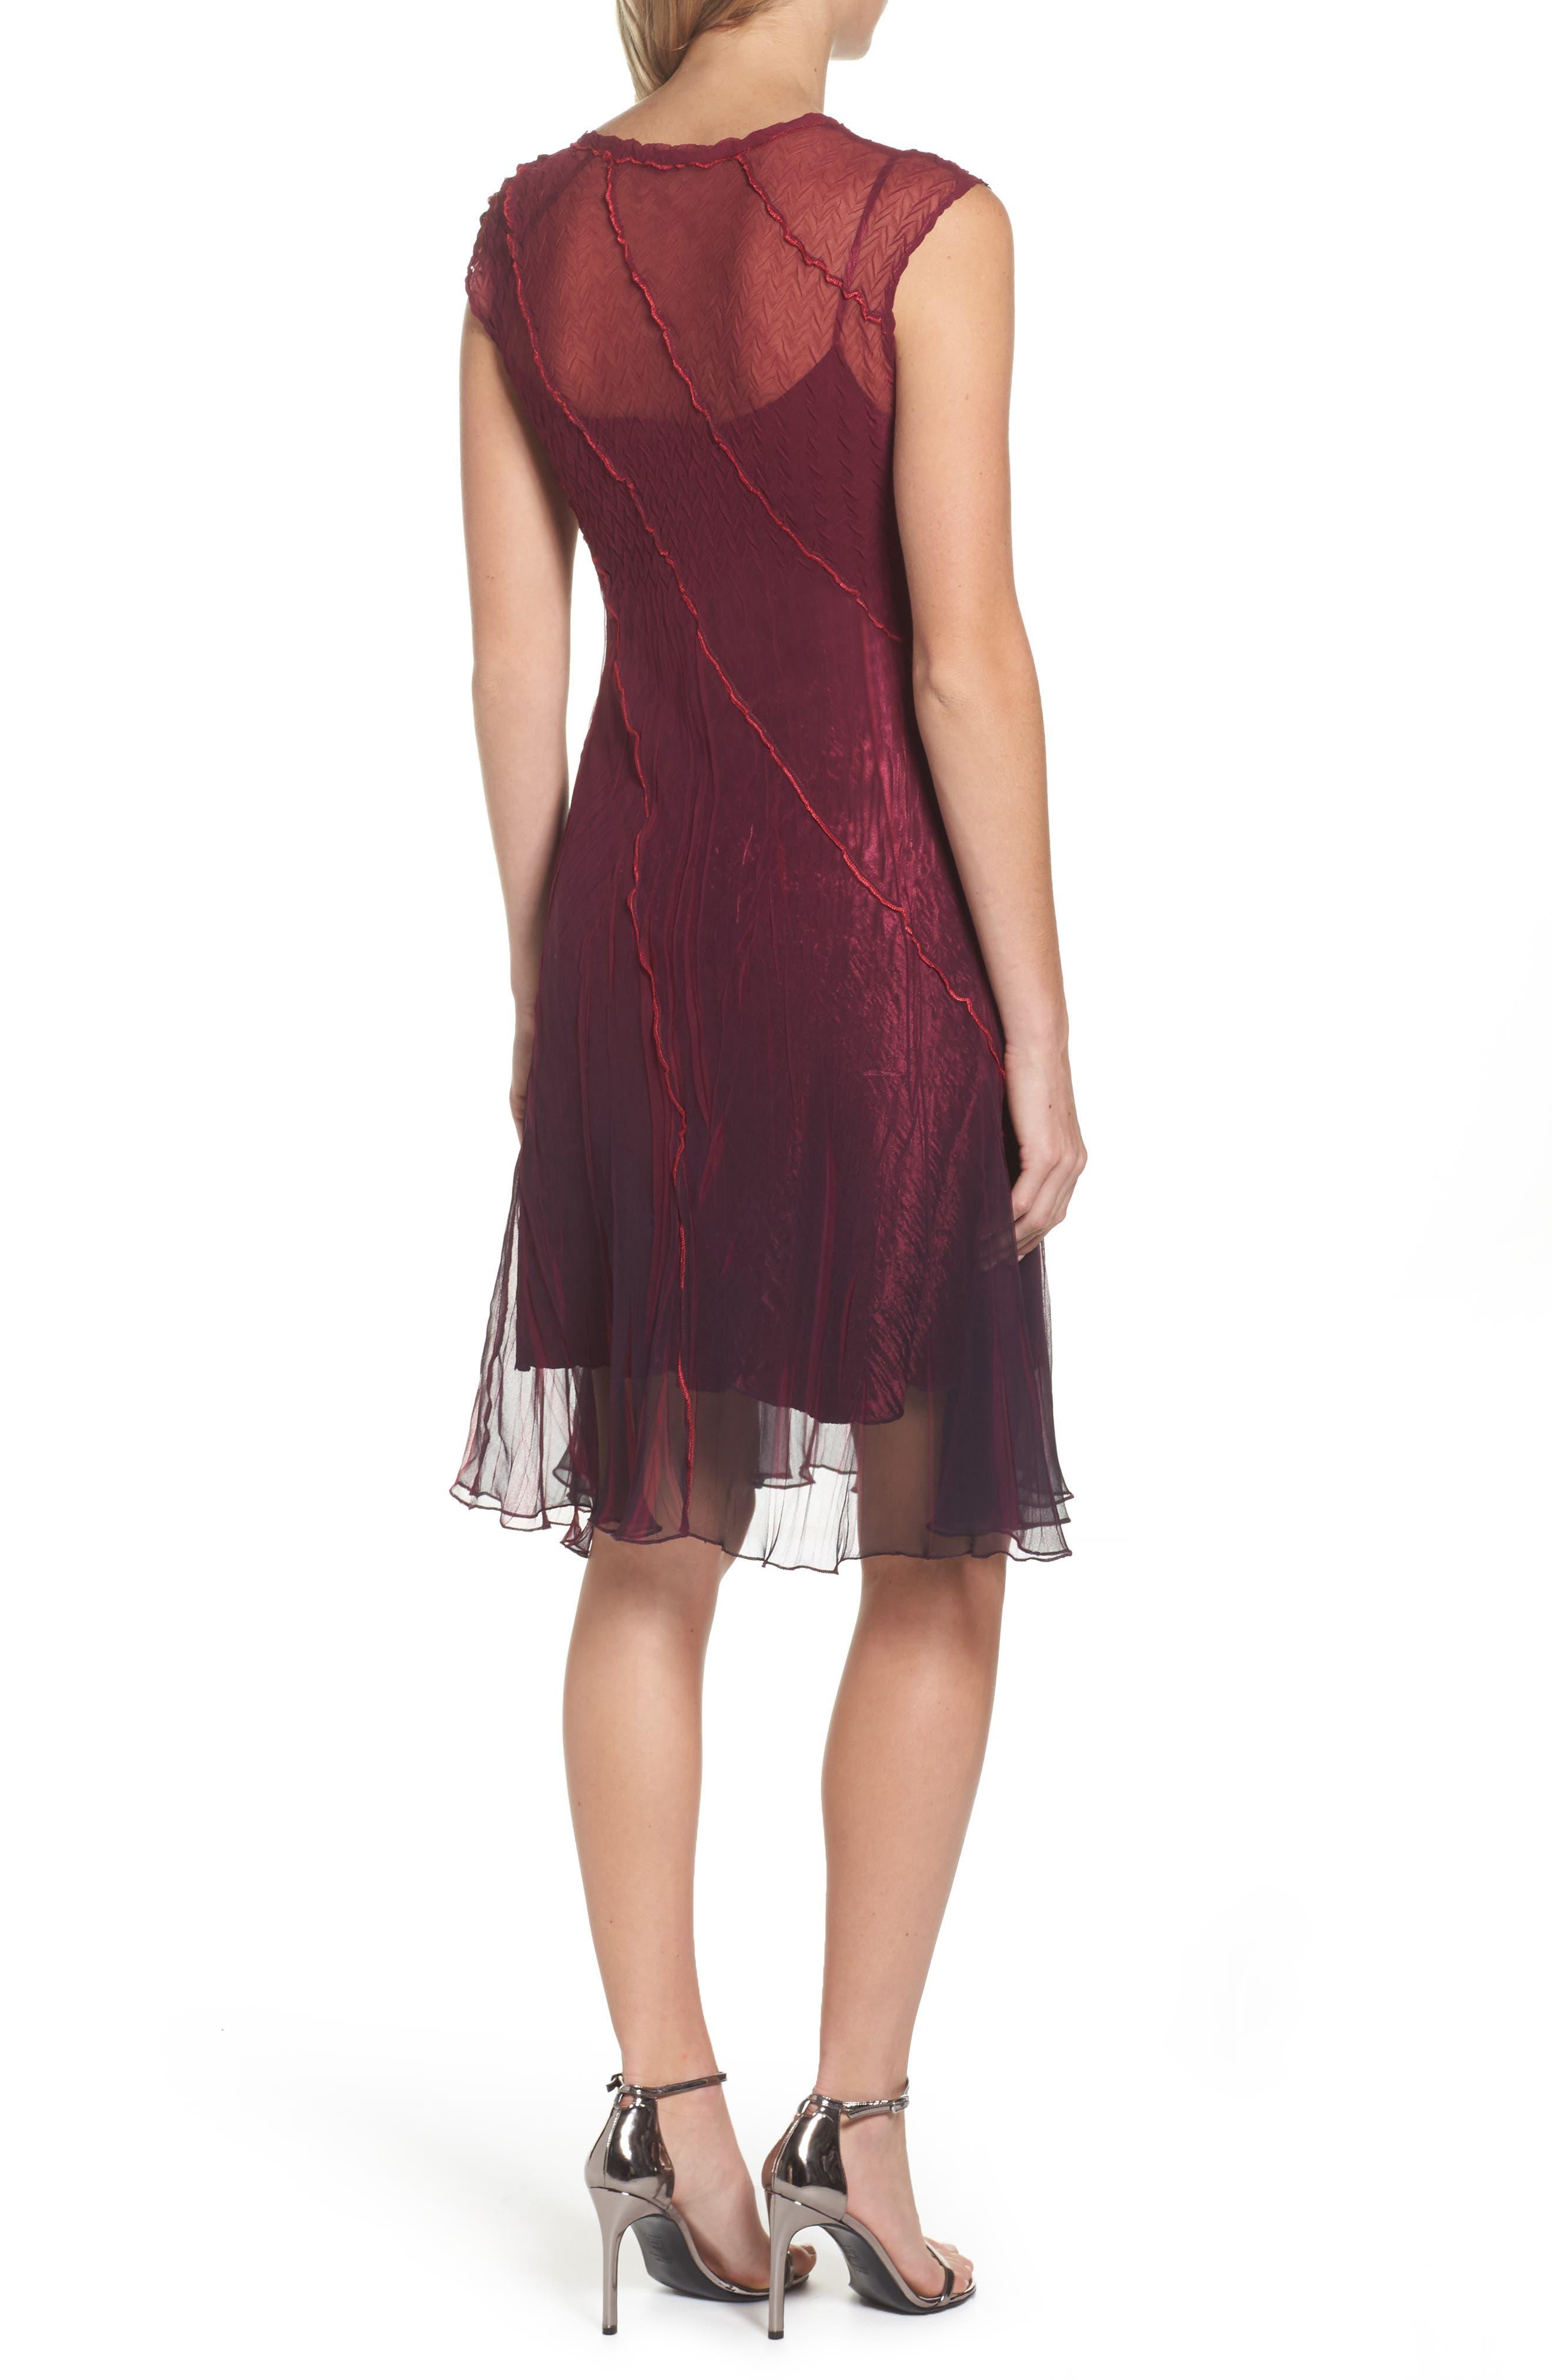 Chiffon A-Line Dress,                             Alternate thumbnail 2, color,                             Red Plum Blue Ombre